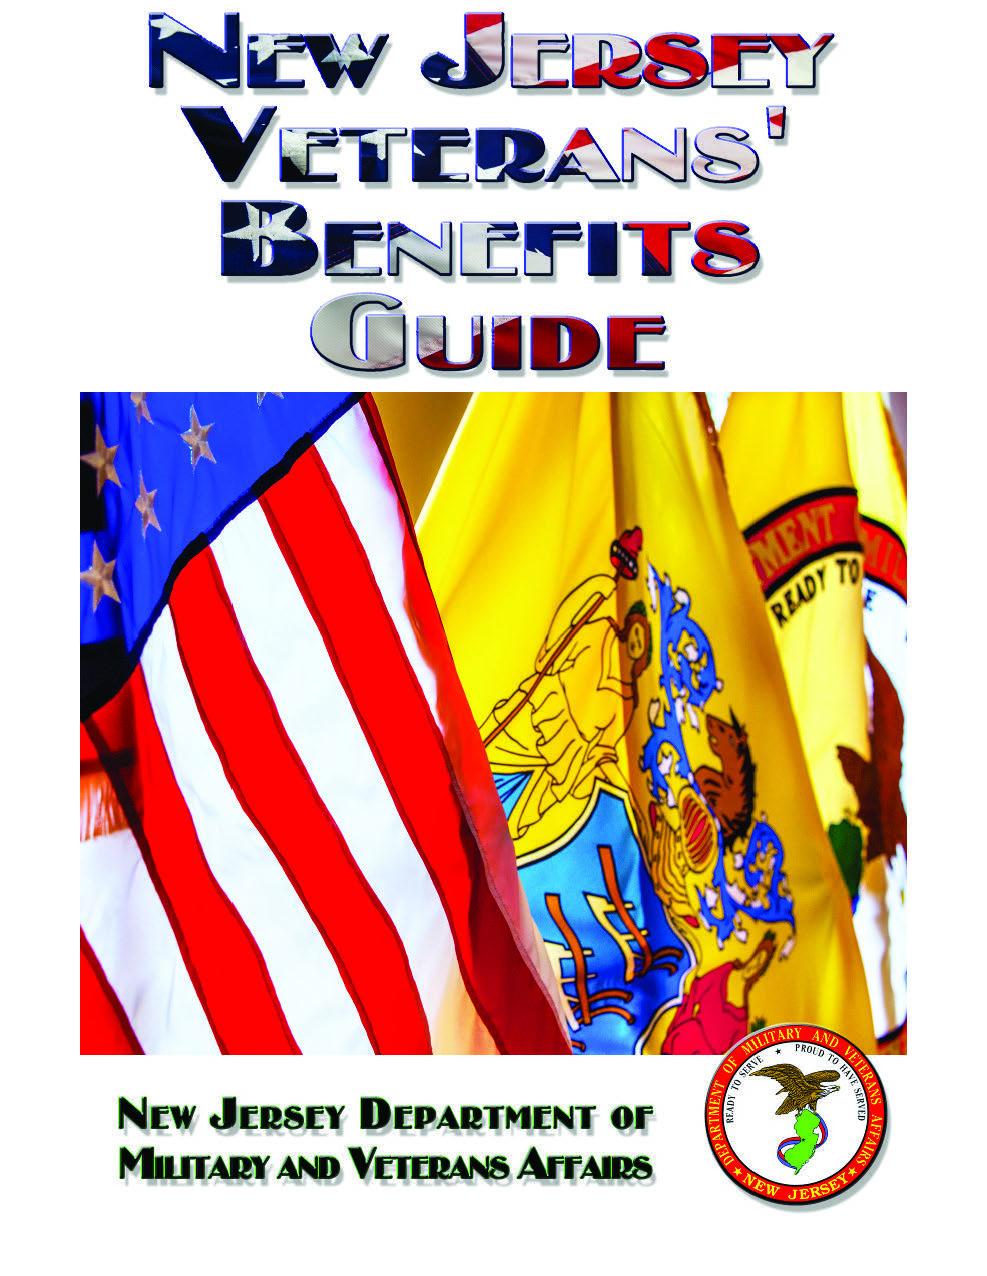 New Jersey Veterans Benefits Guide